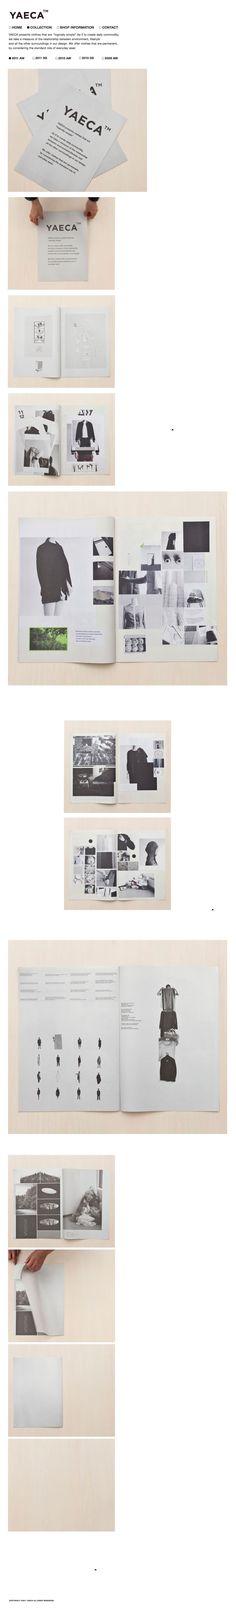 Fashion Branding & layout | typography / graphic design: Yaeca |